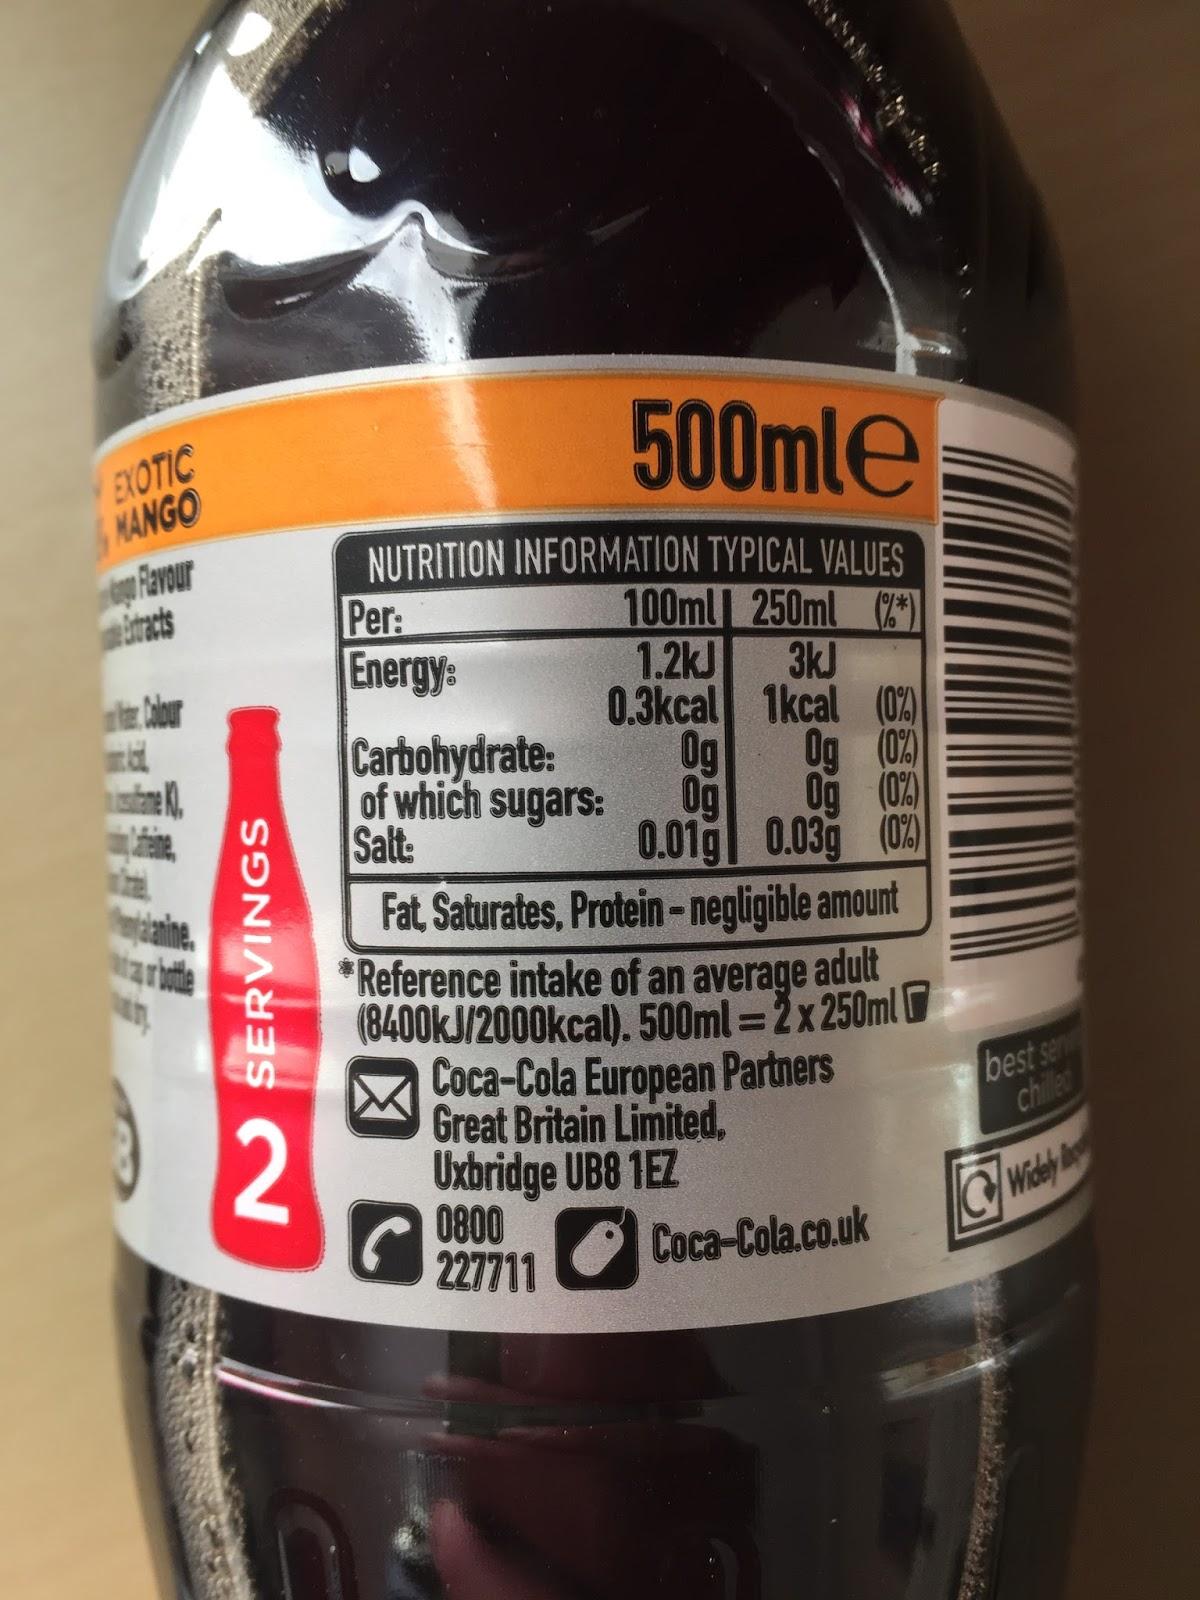 new diet coke exotic mango (uk)